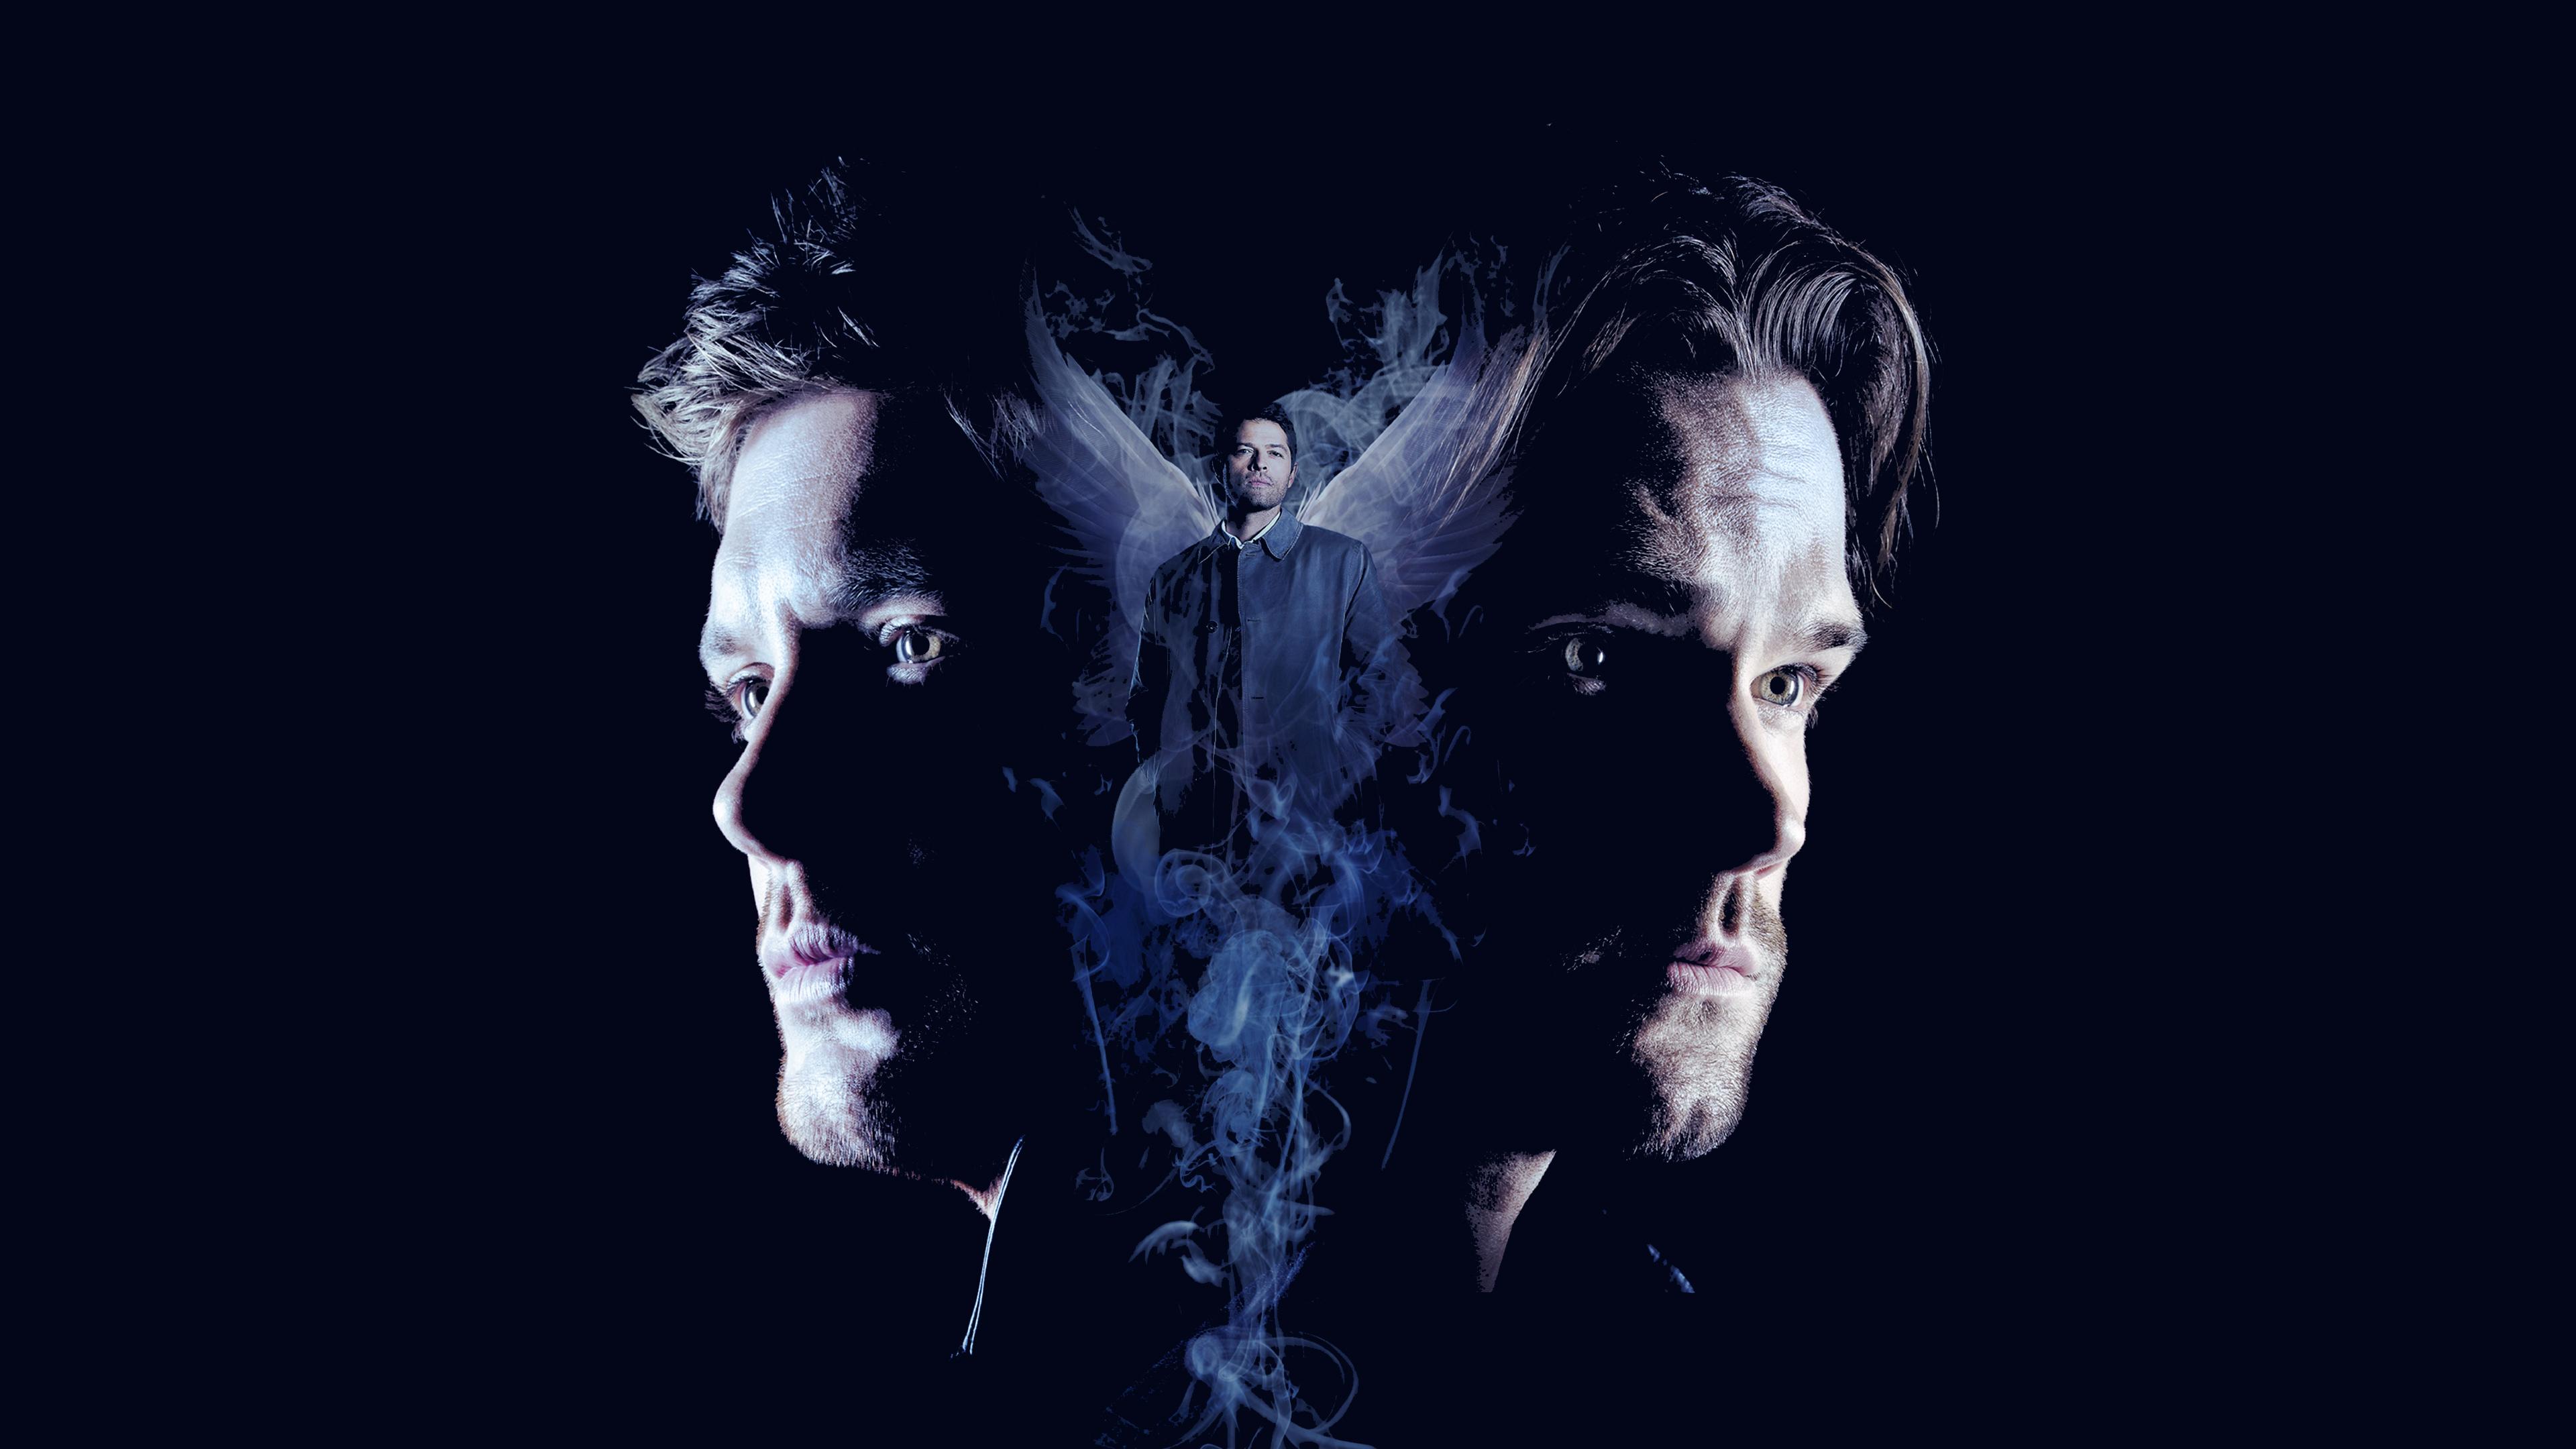 supernatural season 15 1580056486 - Supernatural Season 15 - Supernatural wallpapers 4k, Supernatural Season 15 wallpapers, Supernatural 2020 wallpapers hd 4k